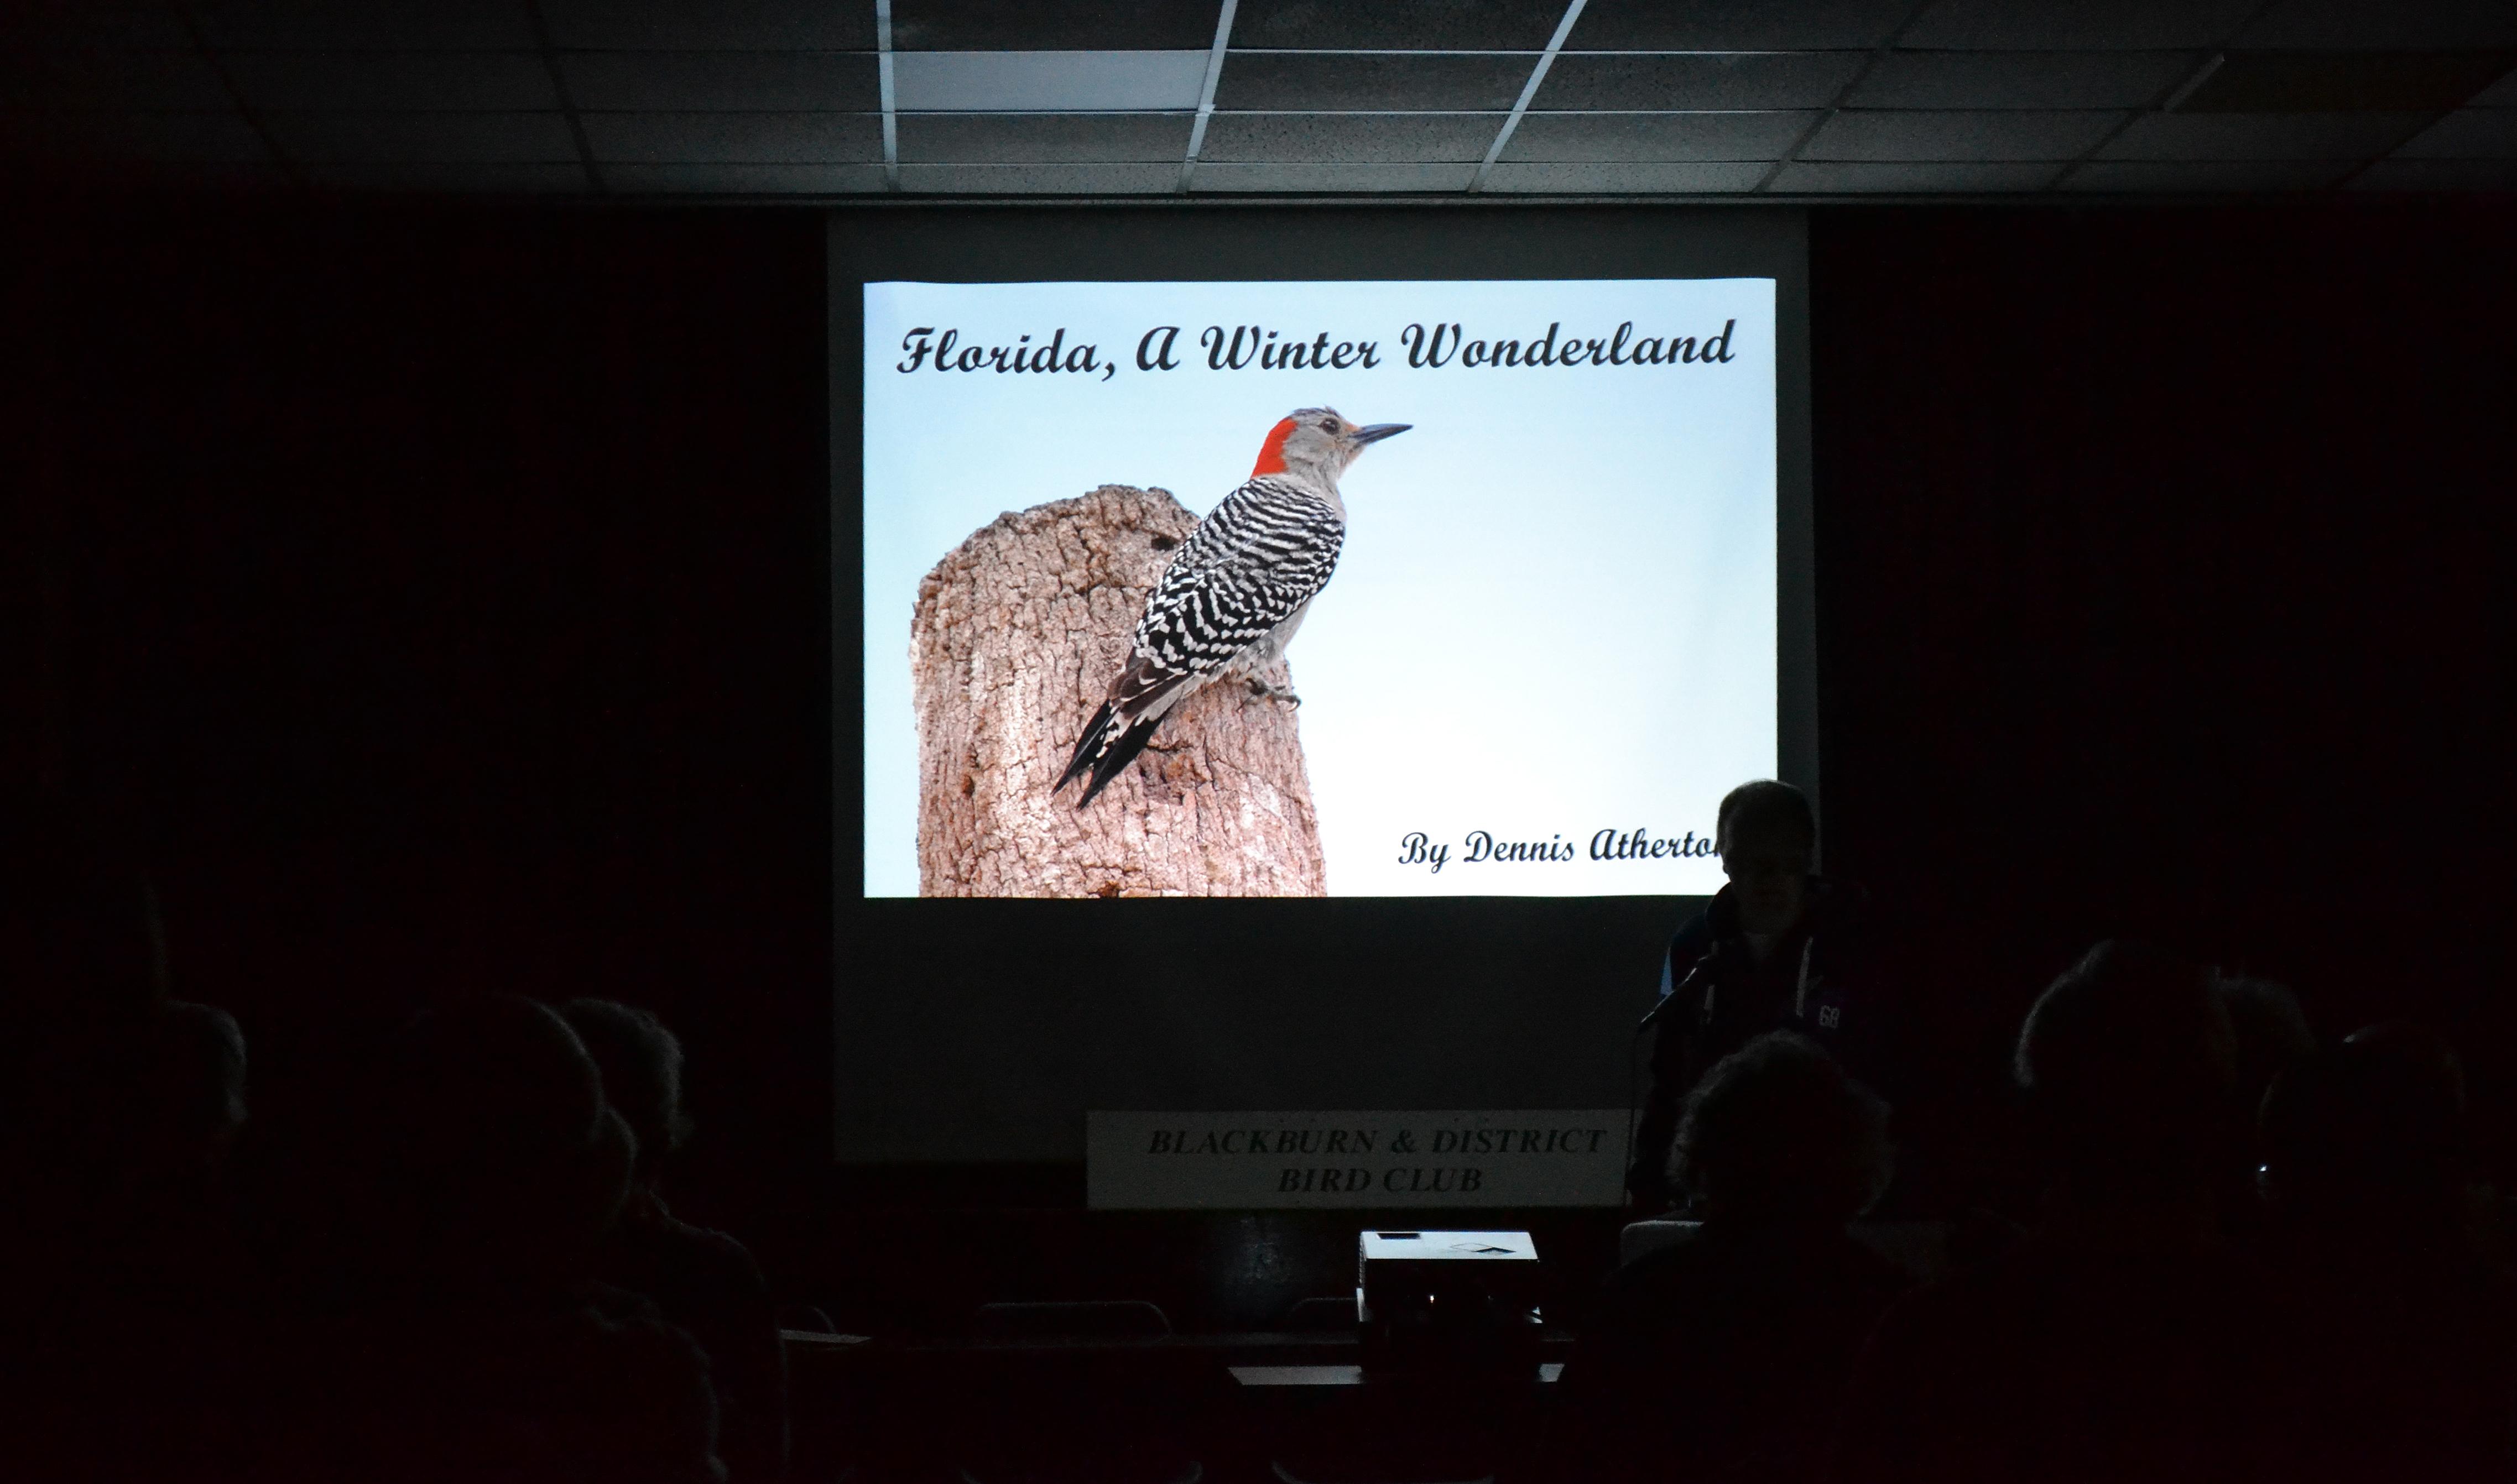 Florida A Winter Wonderland